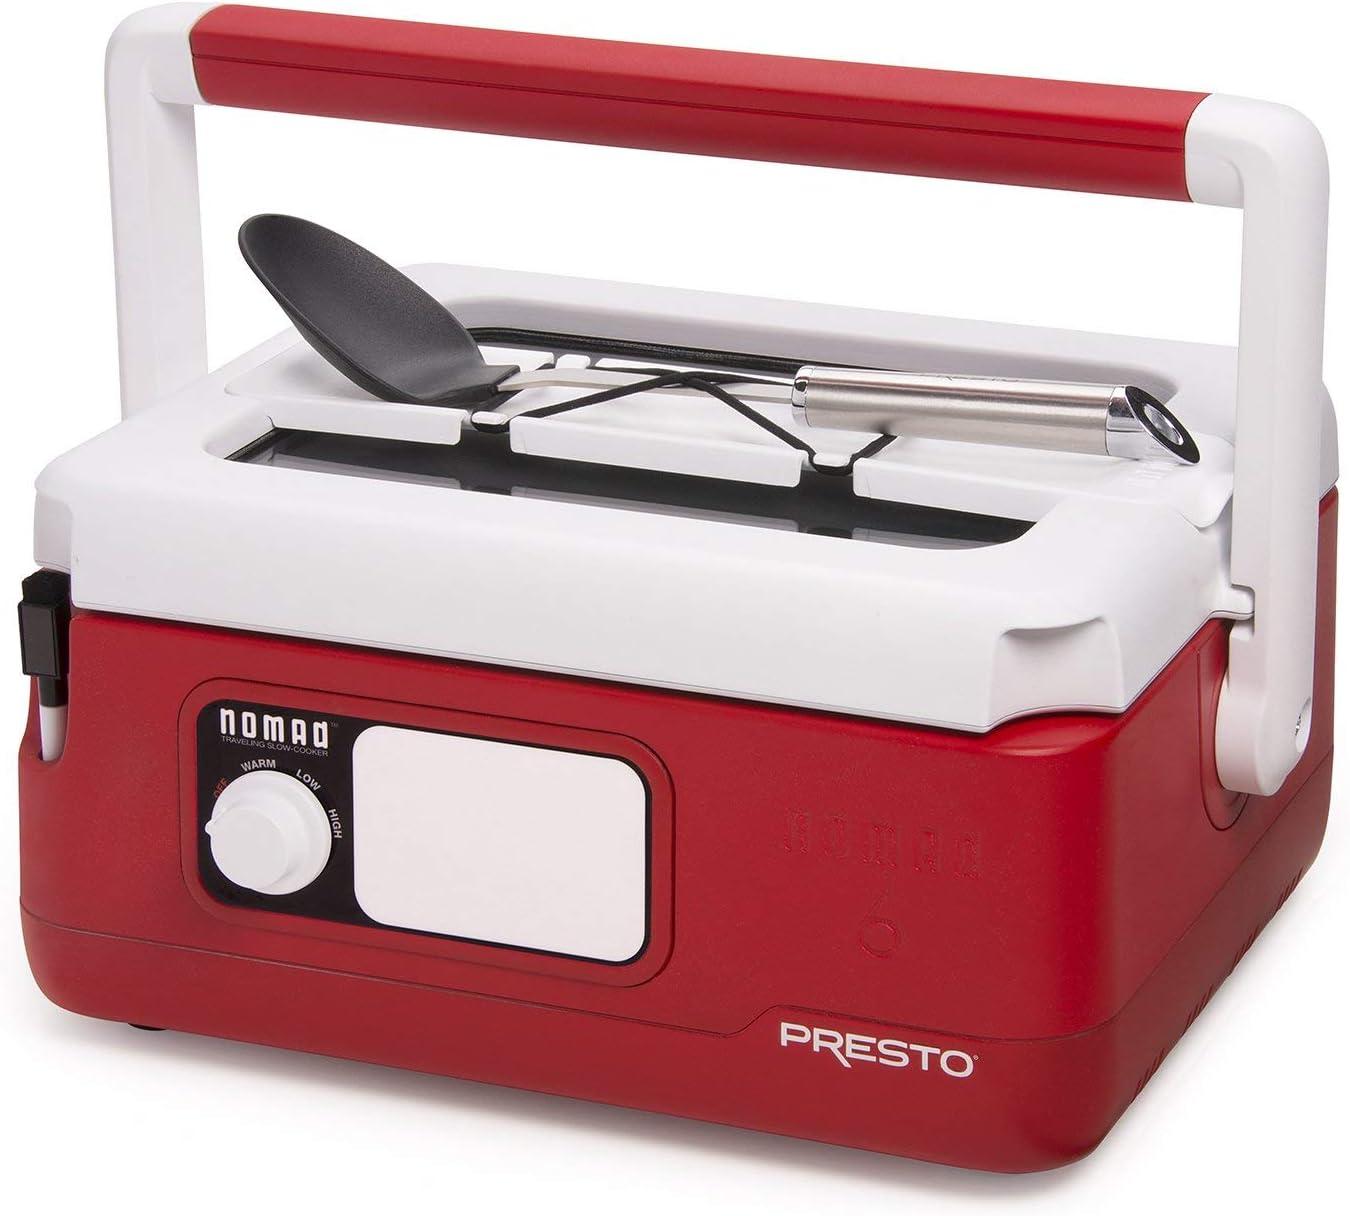 Presto 06011 Slow Cooker, Red (Renewed)